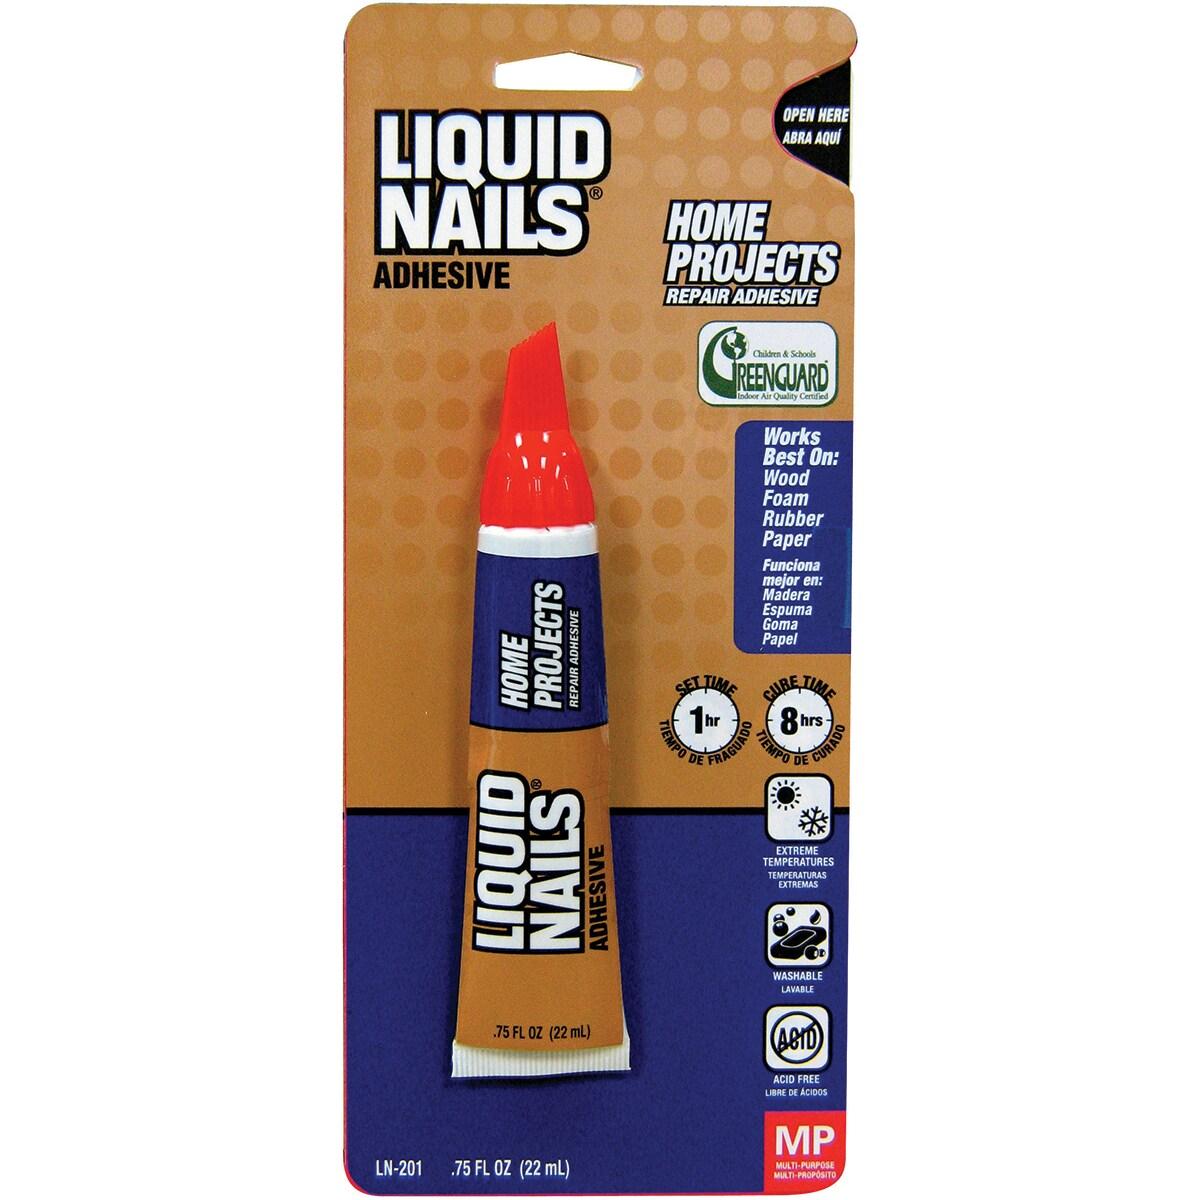 M-D Hobby & Craft Liquid Nails Home Projects Repair Adhes...